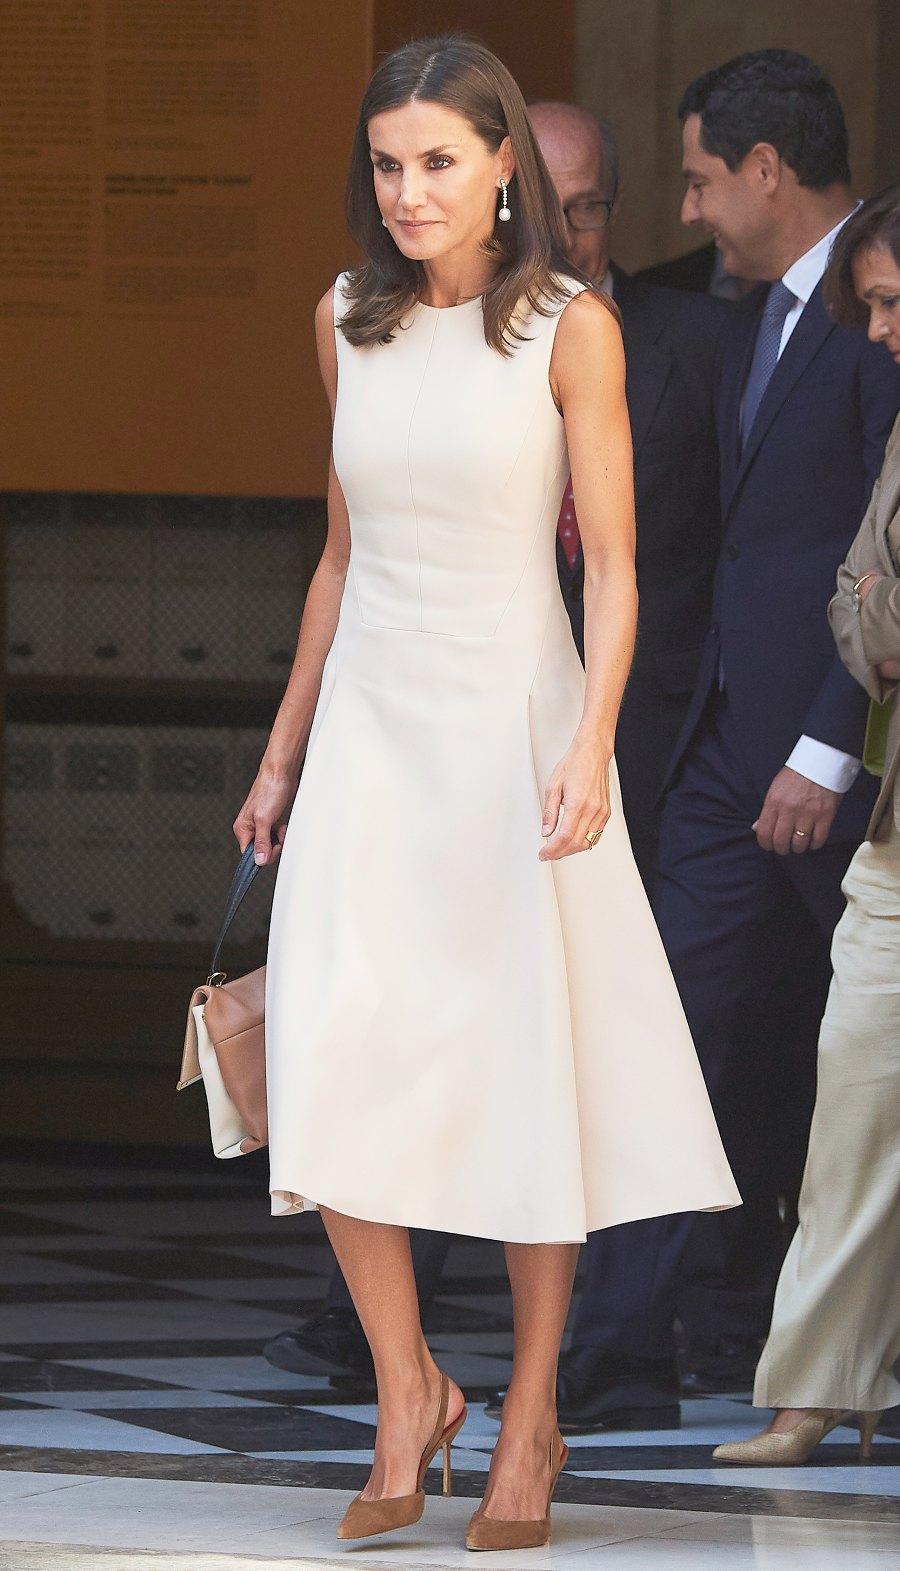 Queen Letizia Cream Dress September 12, 2019